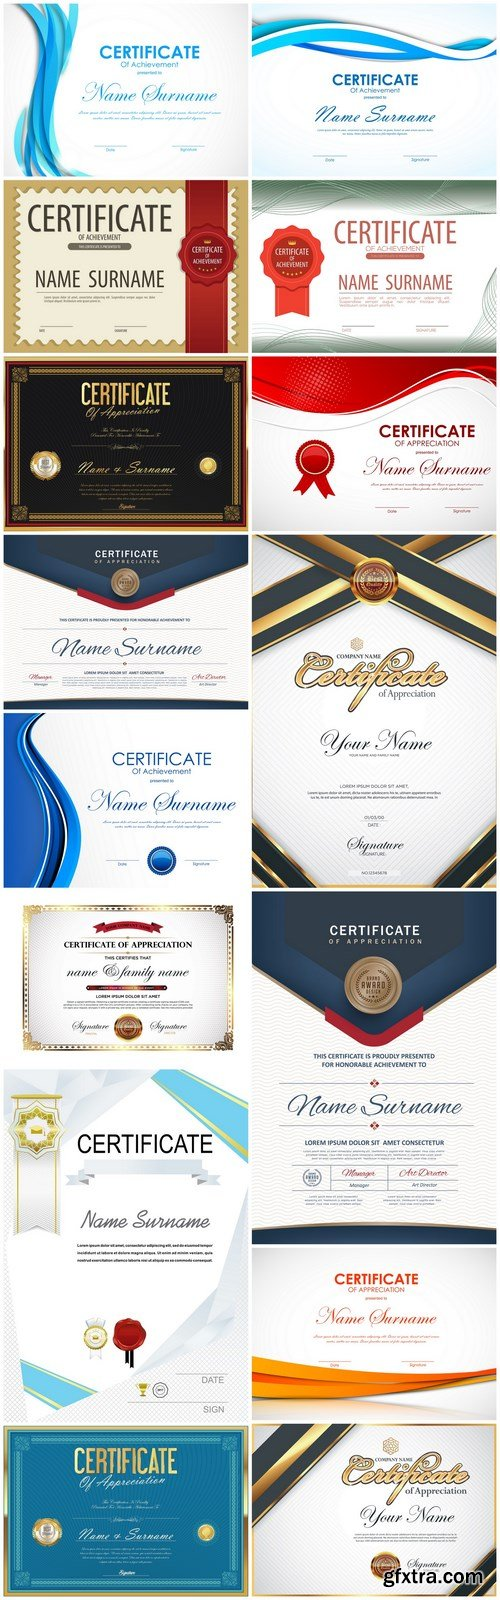 Certificate Design Template - 15 Vector